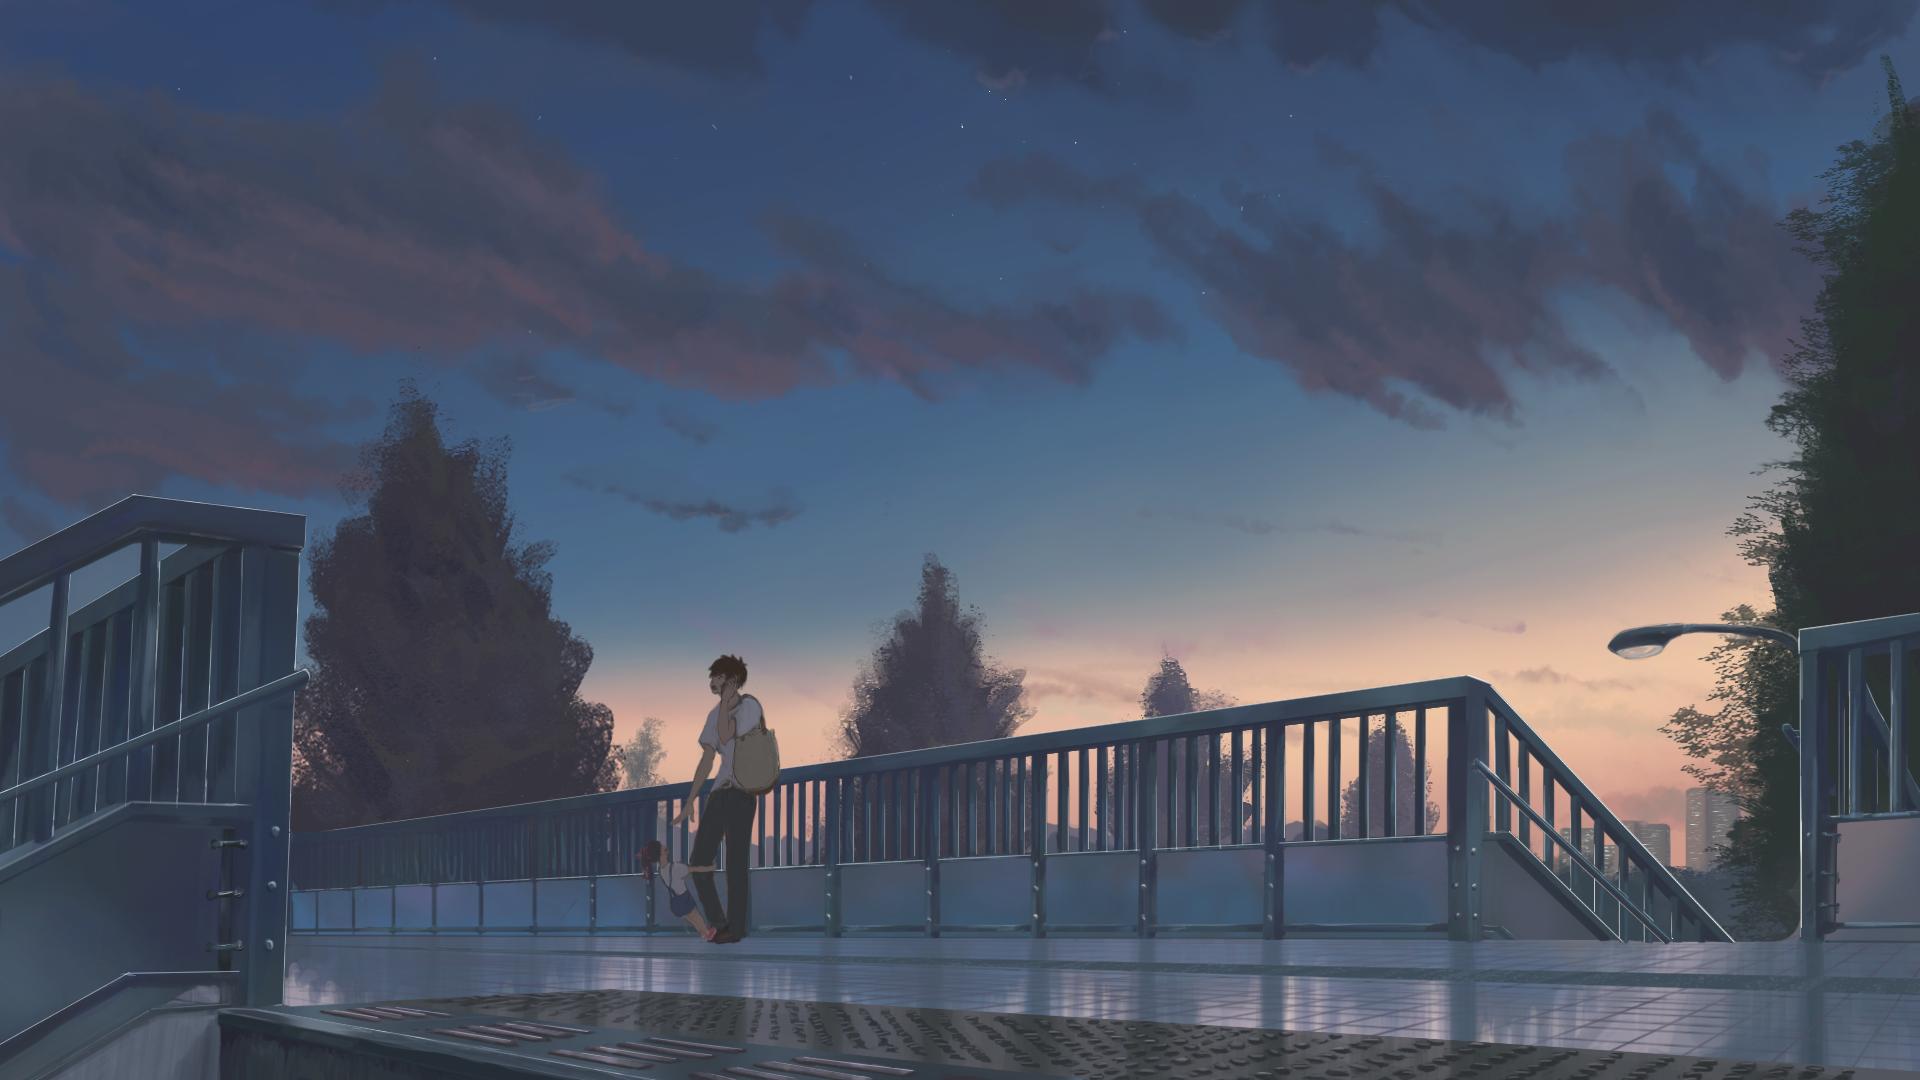 blue anime aesthetic horizontal wallpapers